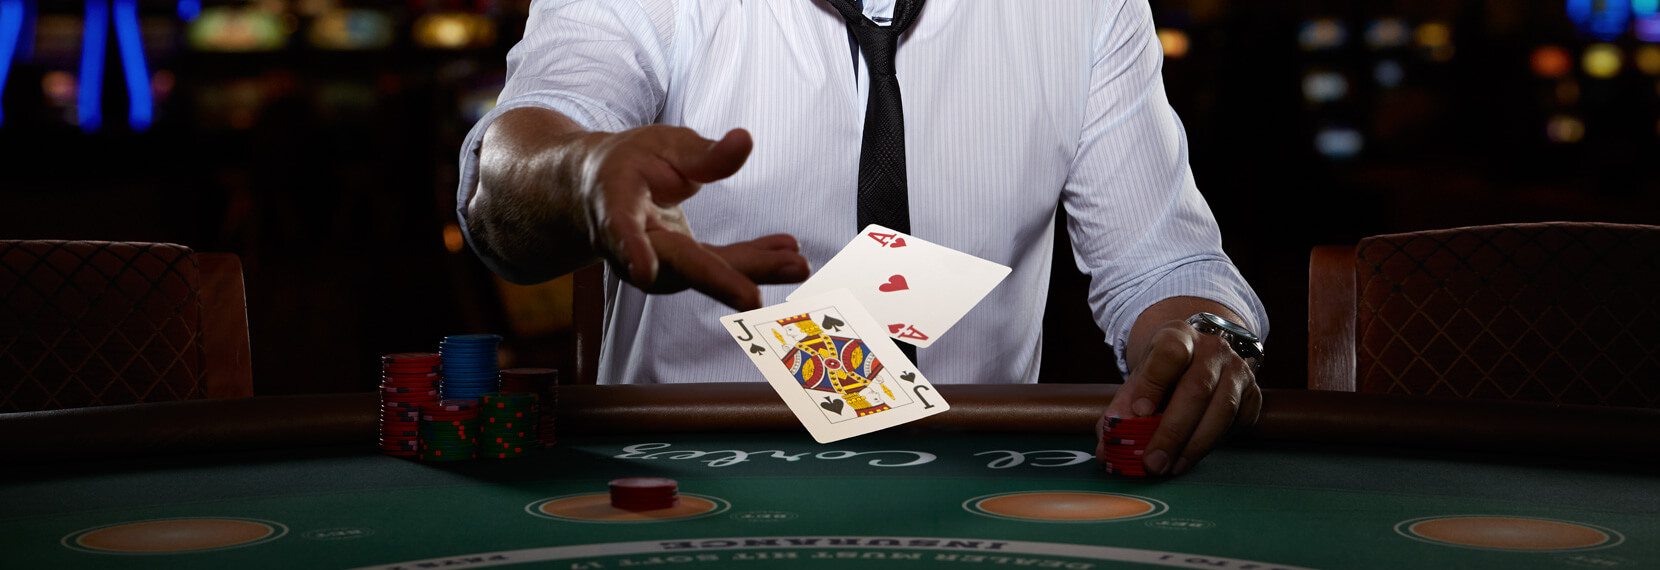 Blackjack France: bon à savoir concernant le blackjack